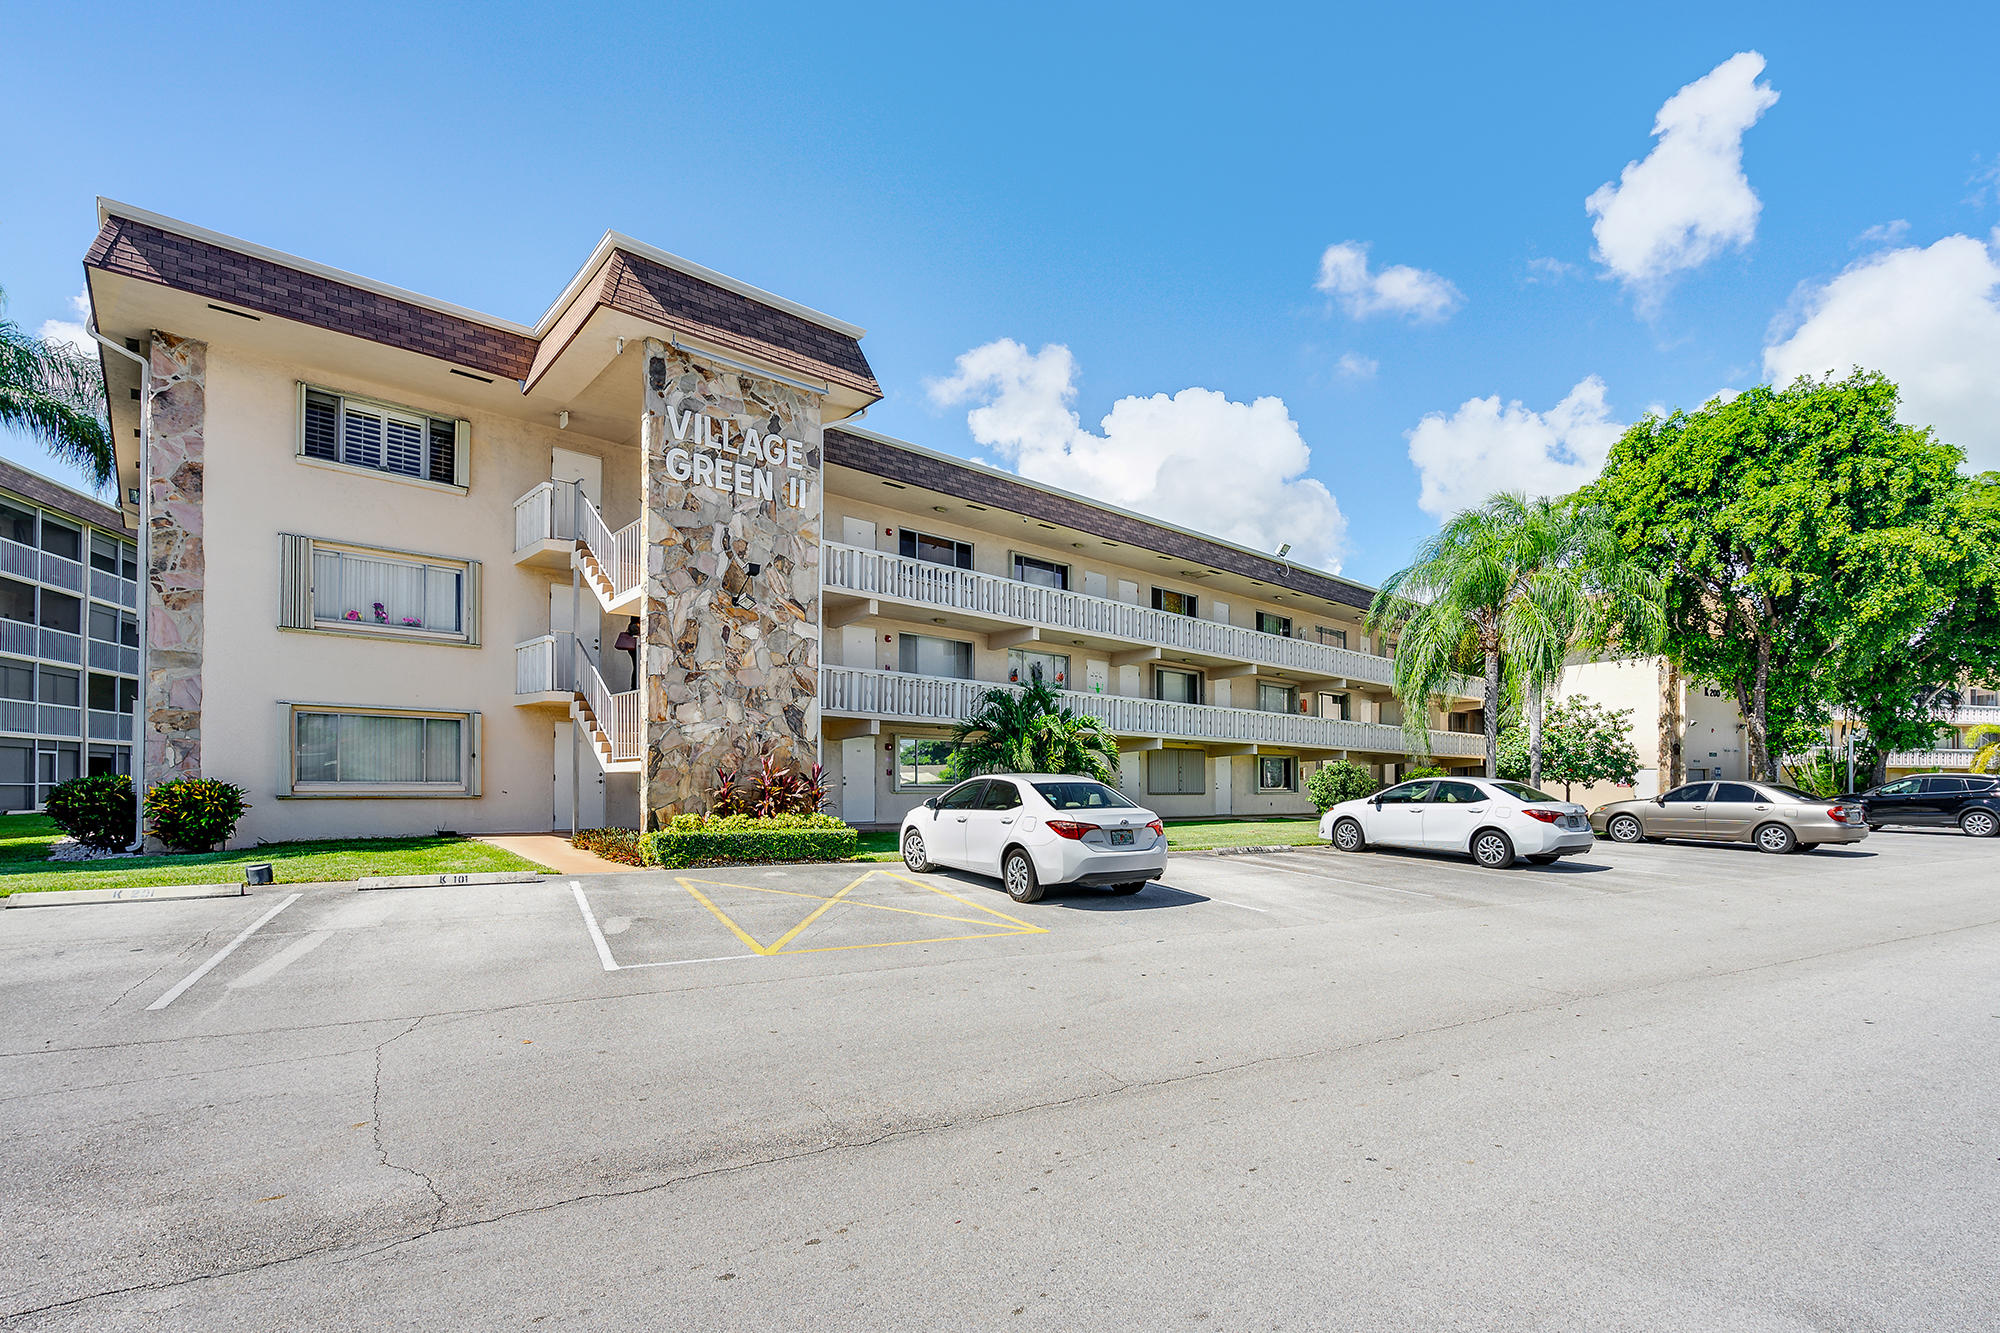 200 Village Green Circle E #203 - 33461 - FL - Palm Springs